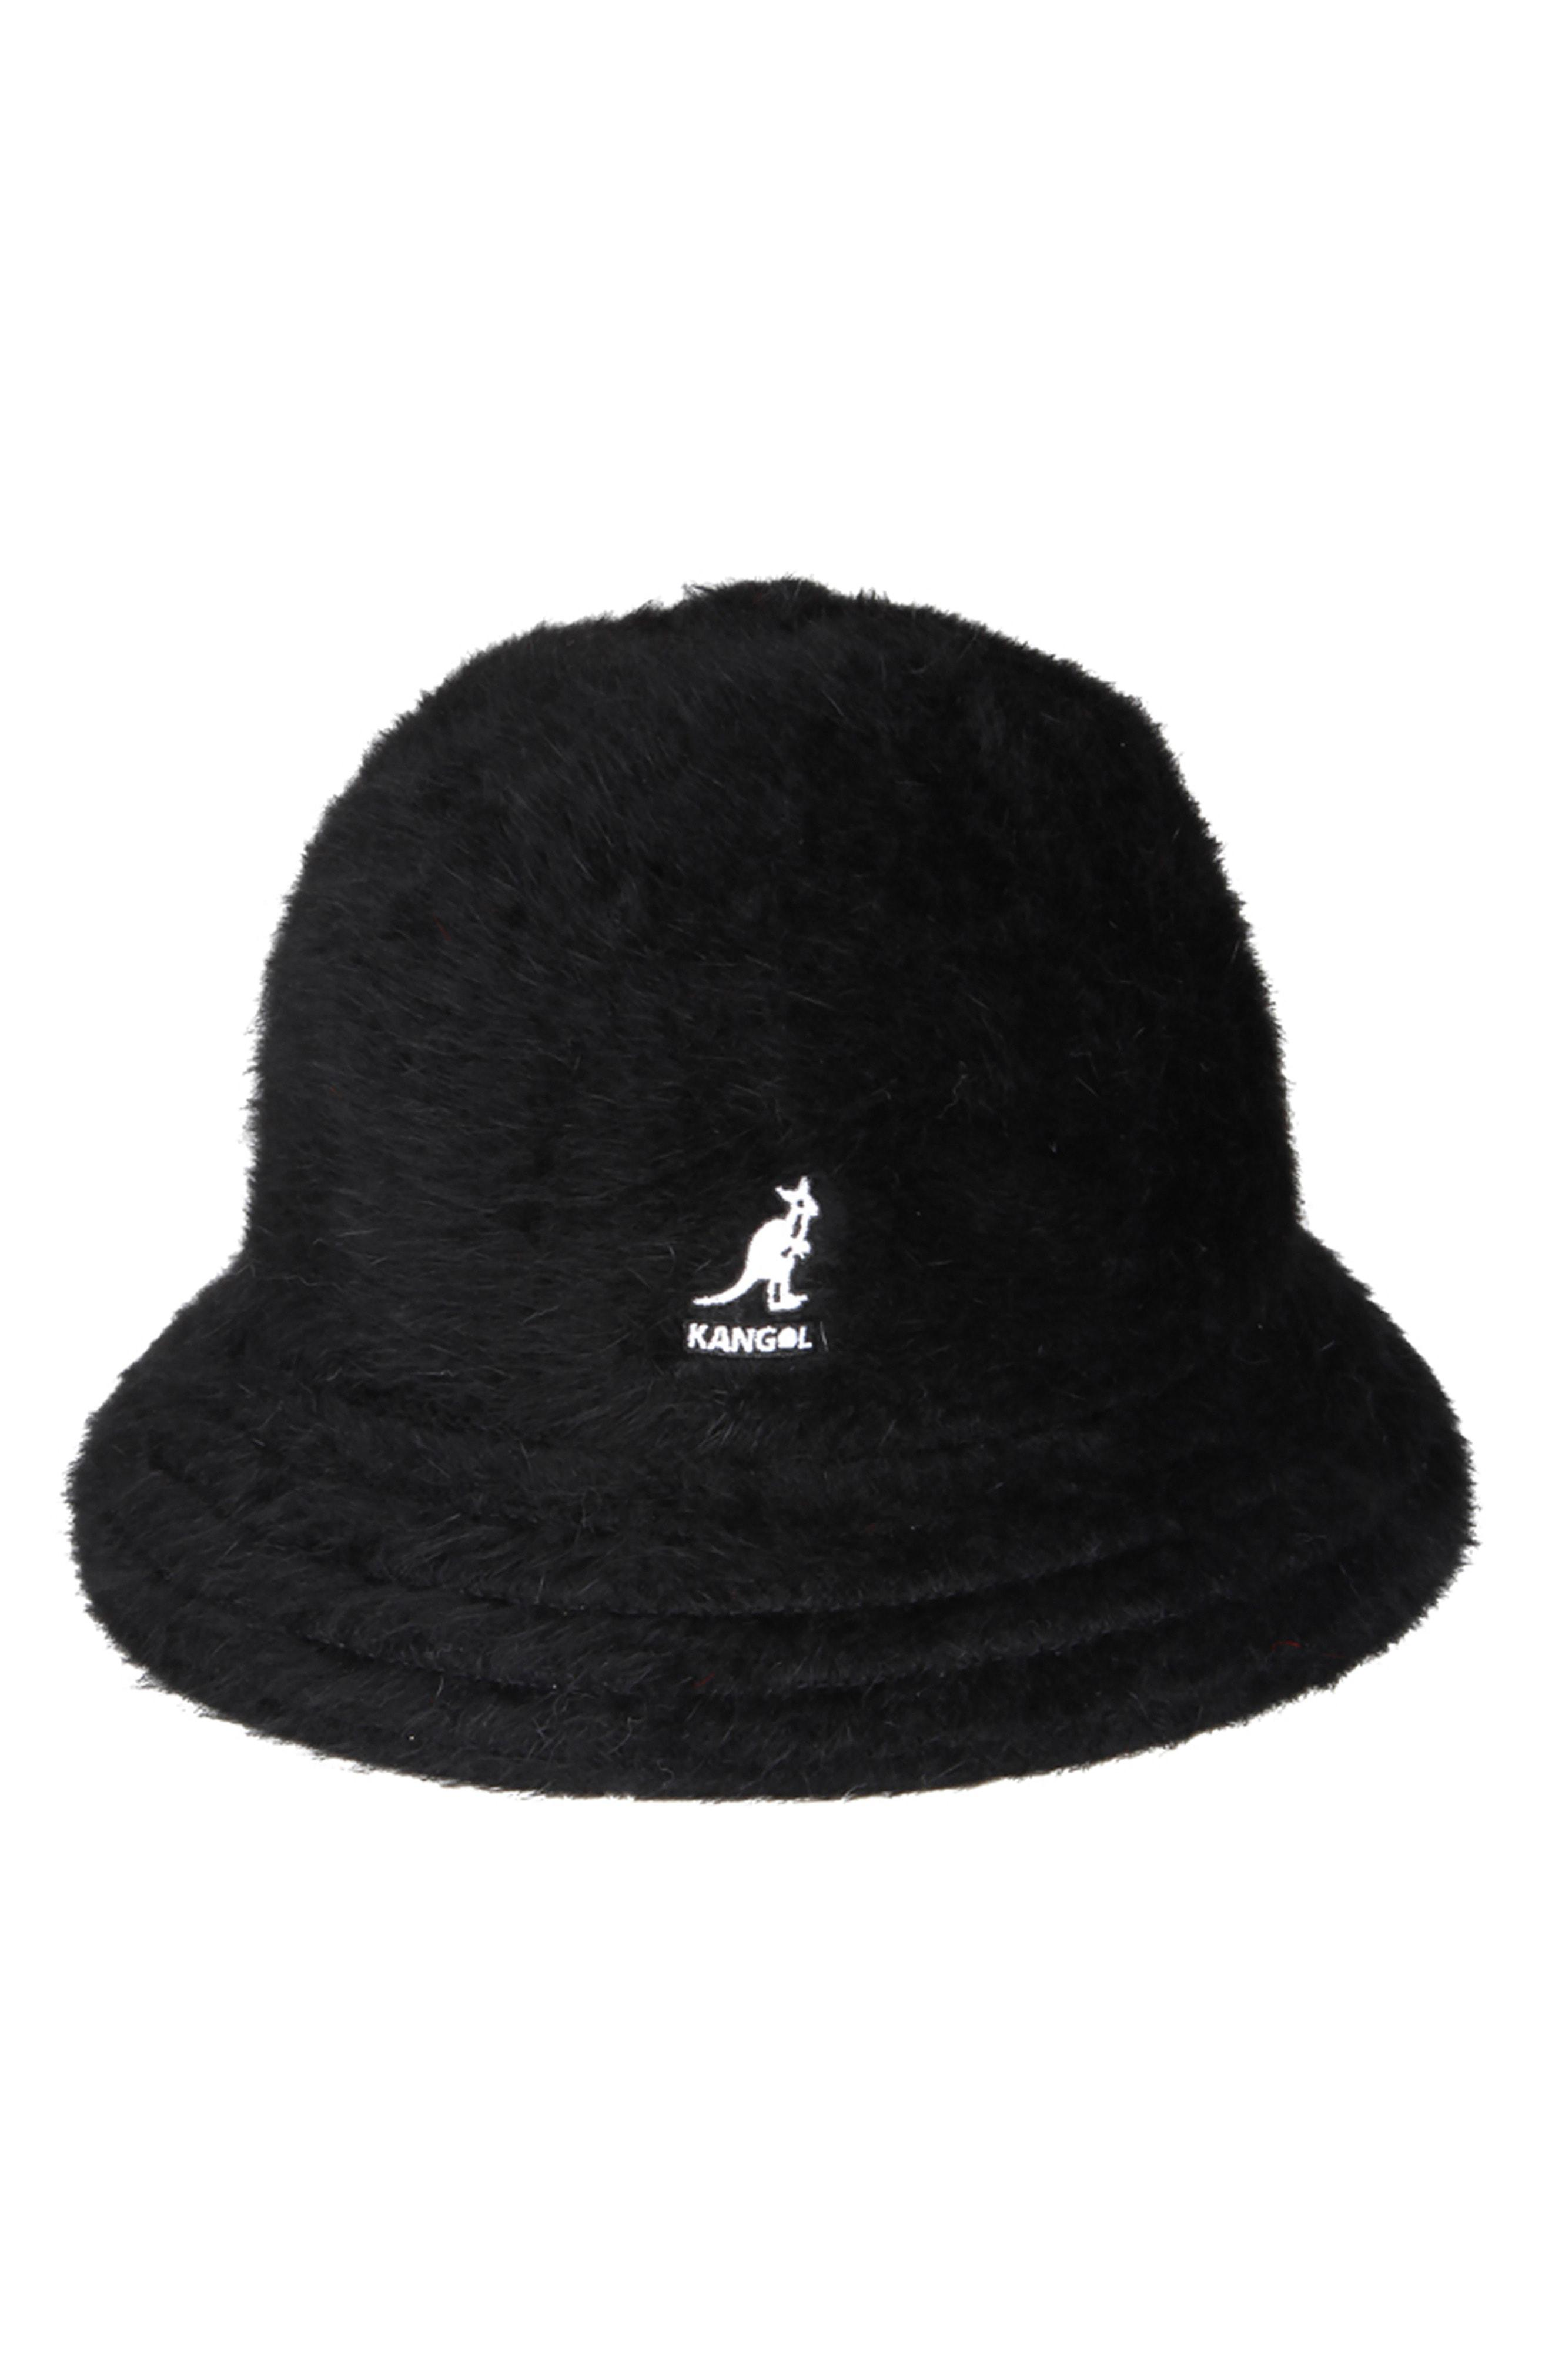 Lyst - Kangol Furgora Casual Bucket Hat in Black c4ff477d3c51